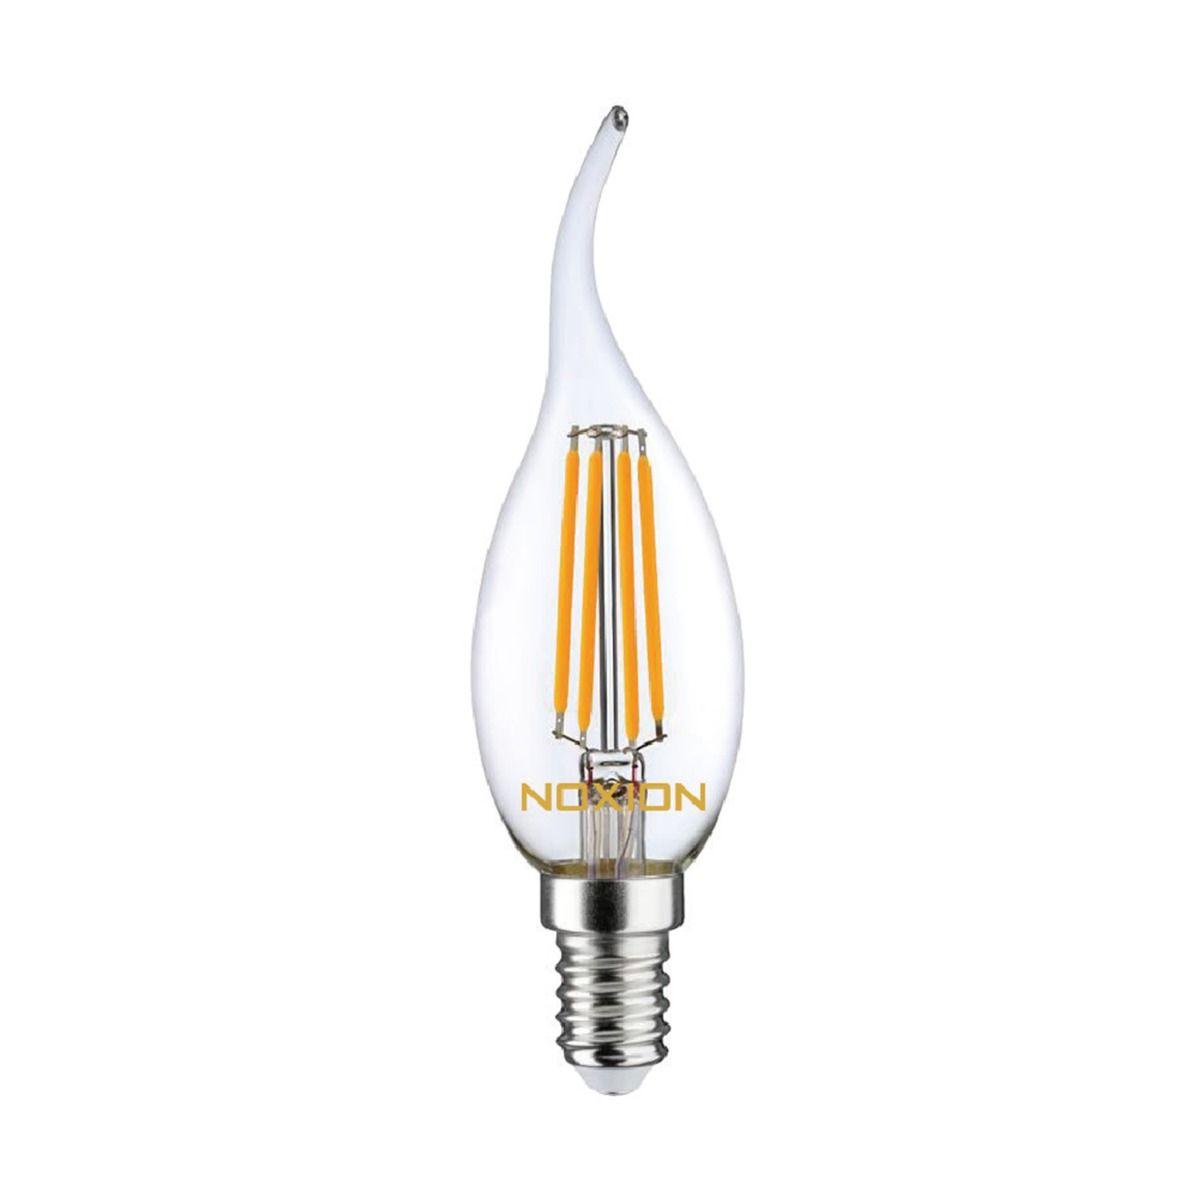 Noxion Lucent Filament LED Candle 4.5W 827 BA35 E14 Klar   Dimbar - Extra Varm Vit - Ersättare 40W